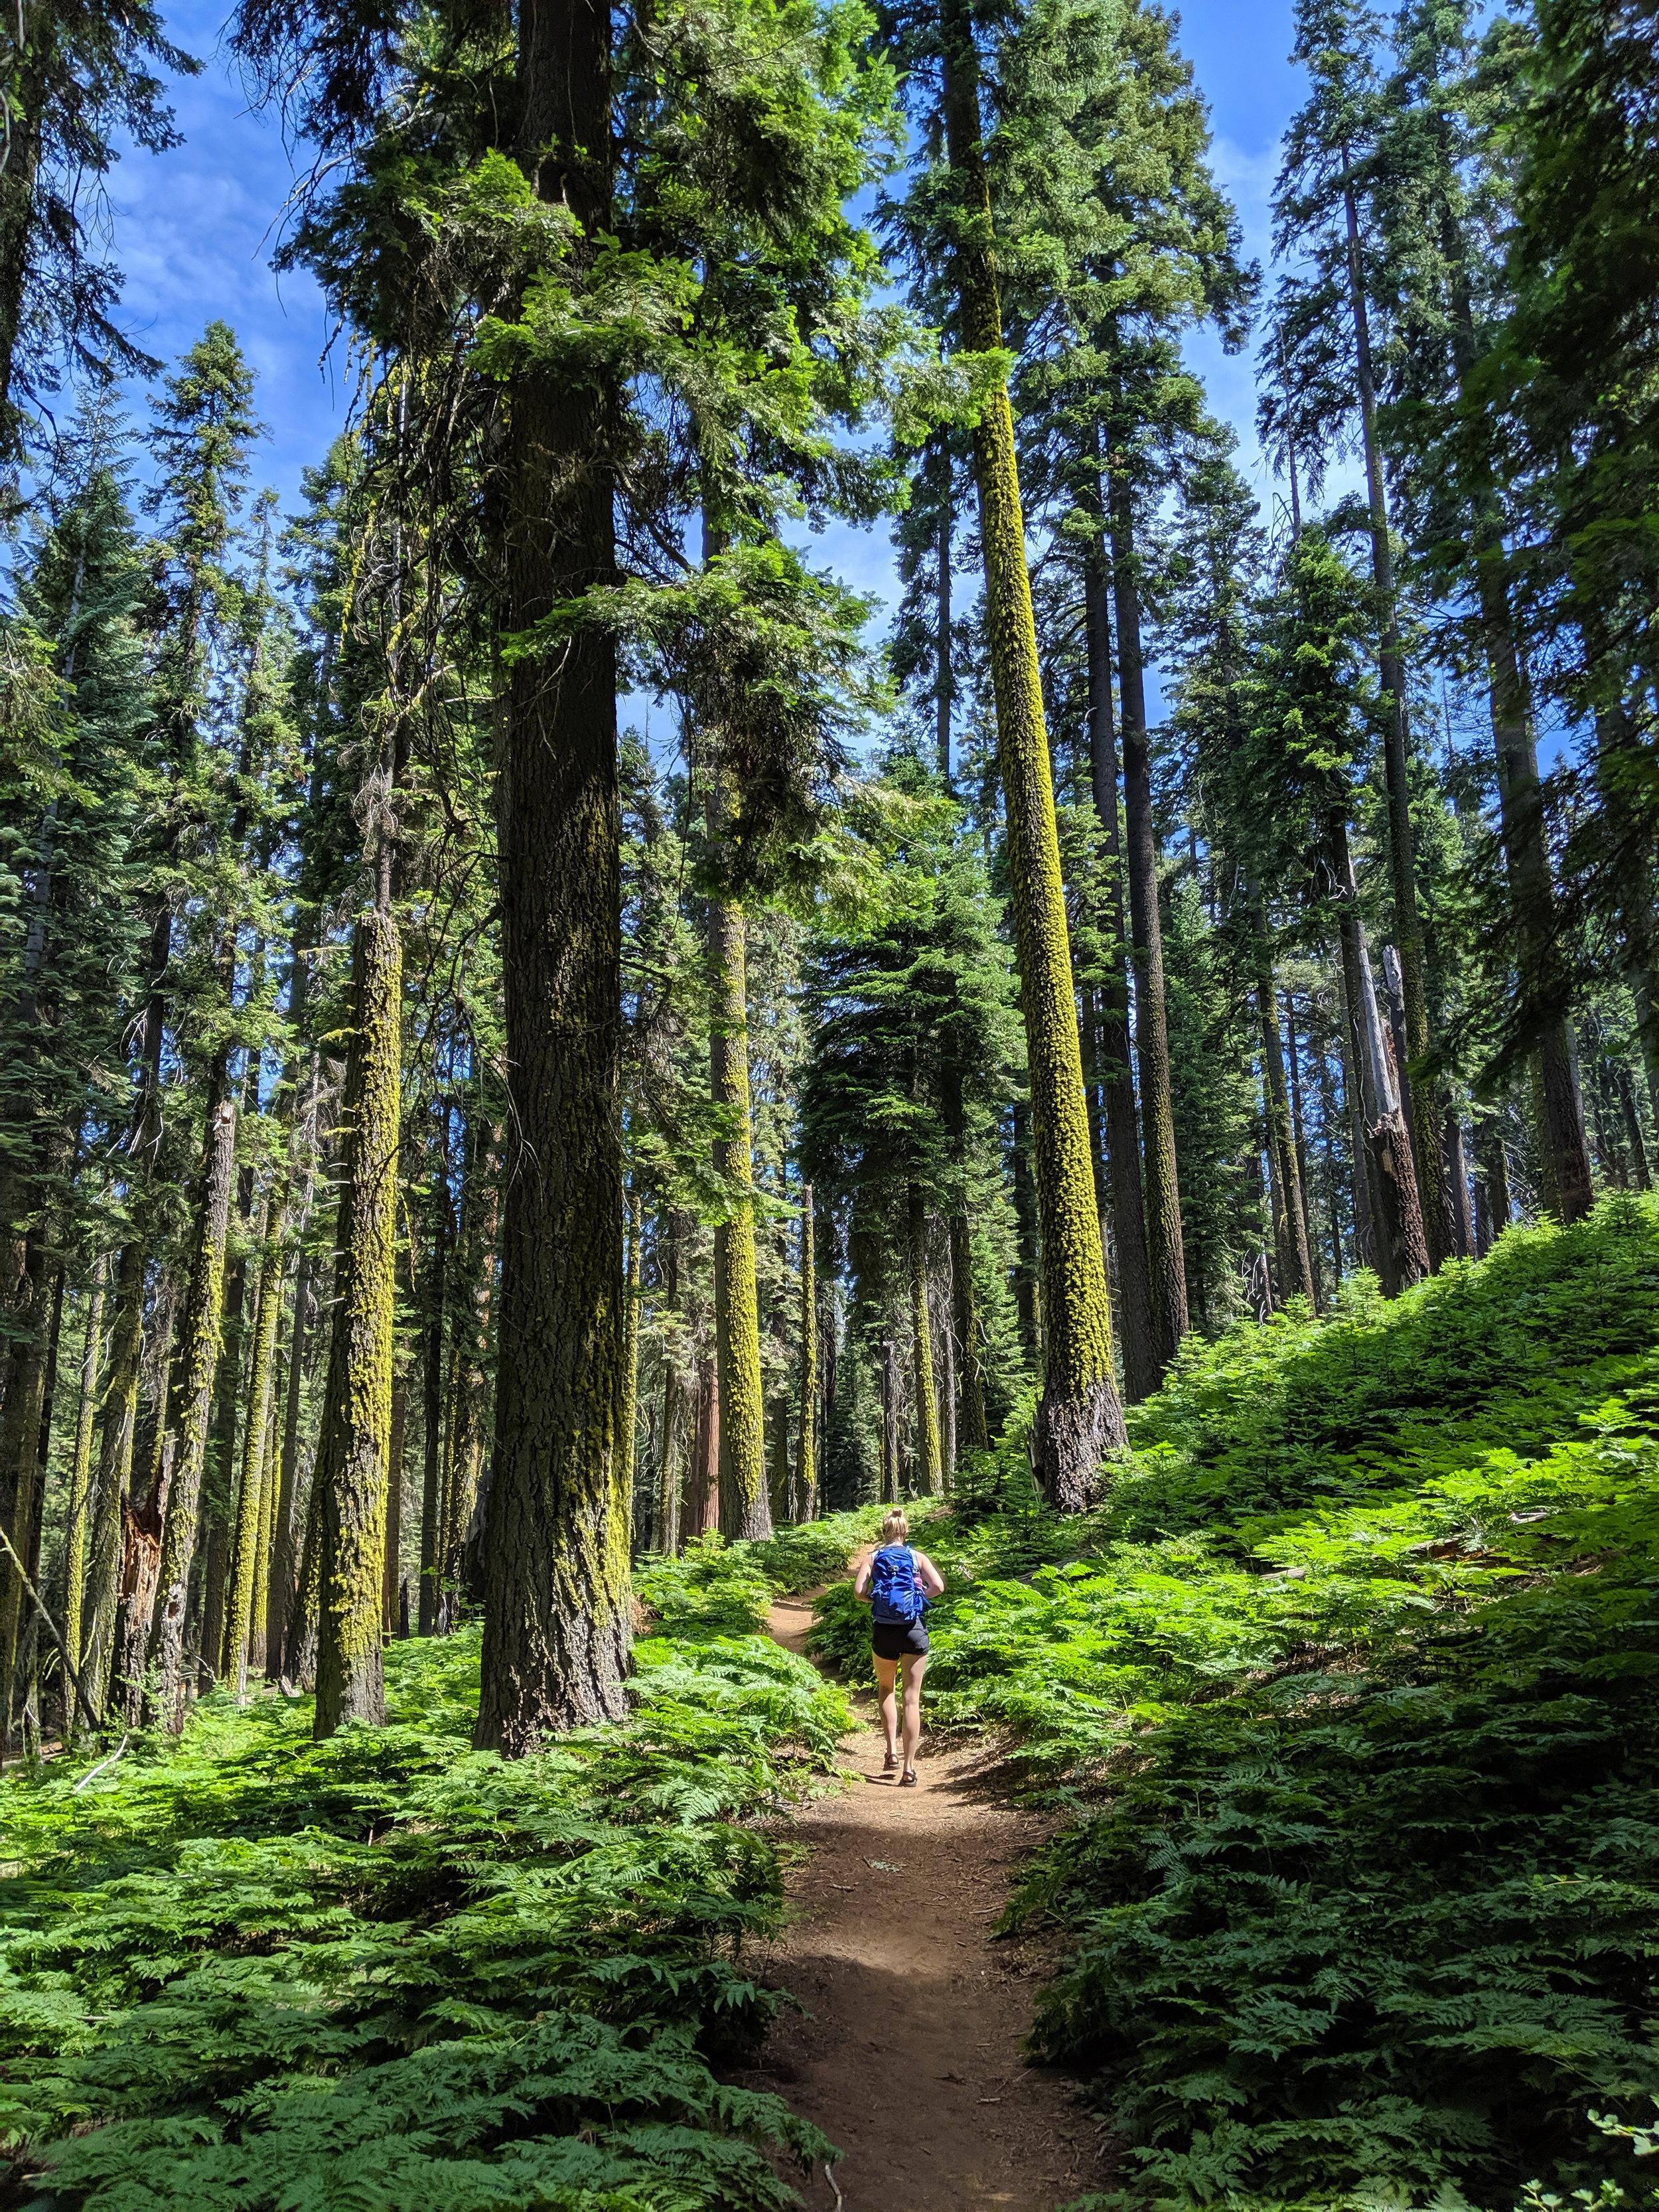 Sequoia, Sequoia National Park, CA National Parks